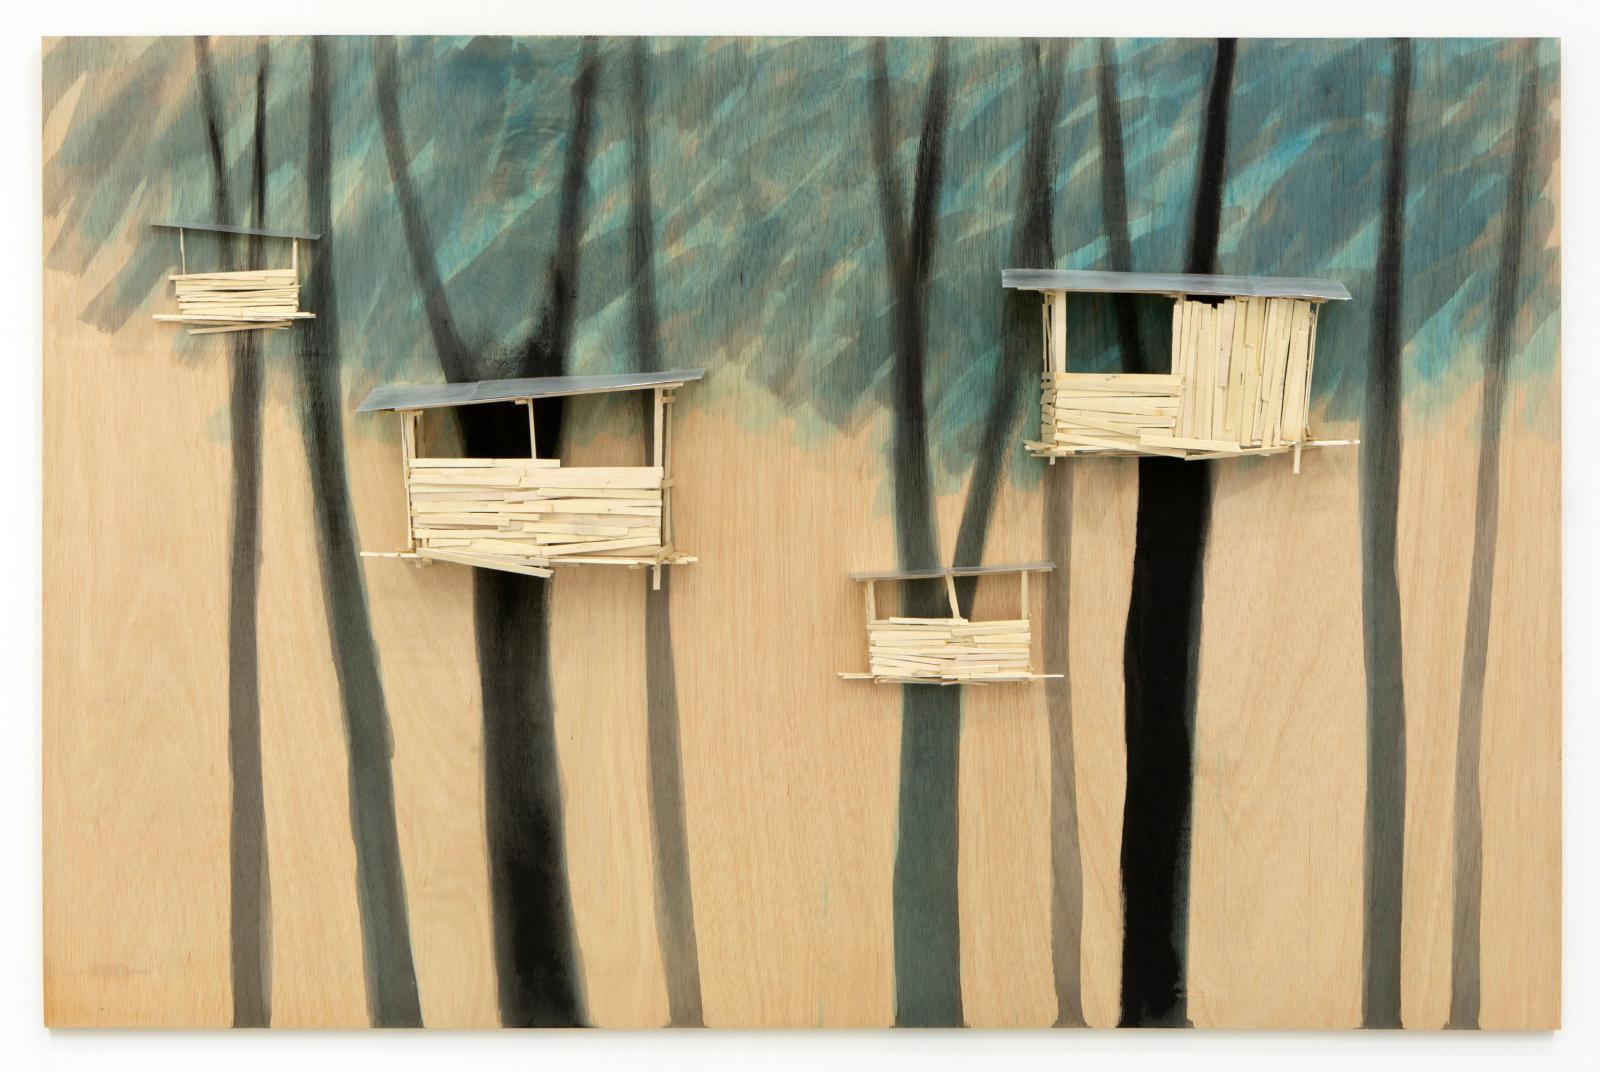 Tadashi Kawamata, Tree hut in Tremblay Plan n°90, 2021, maquette en bois, colle et peinture, 100x153x12cm. ©Tadashi Kawamata - Phot